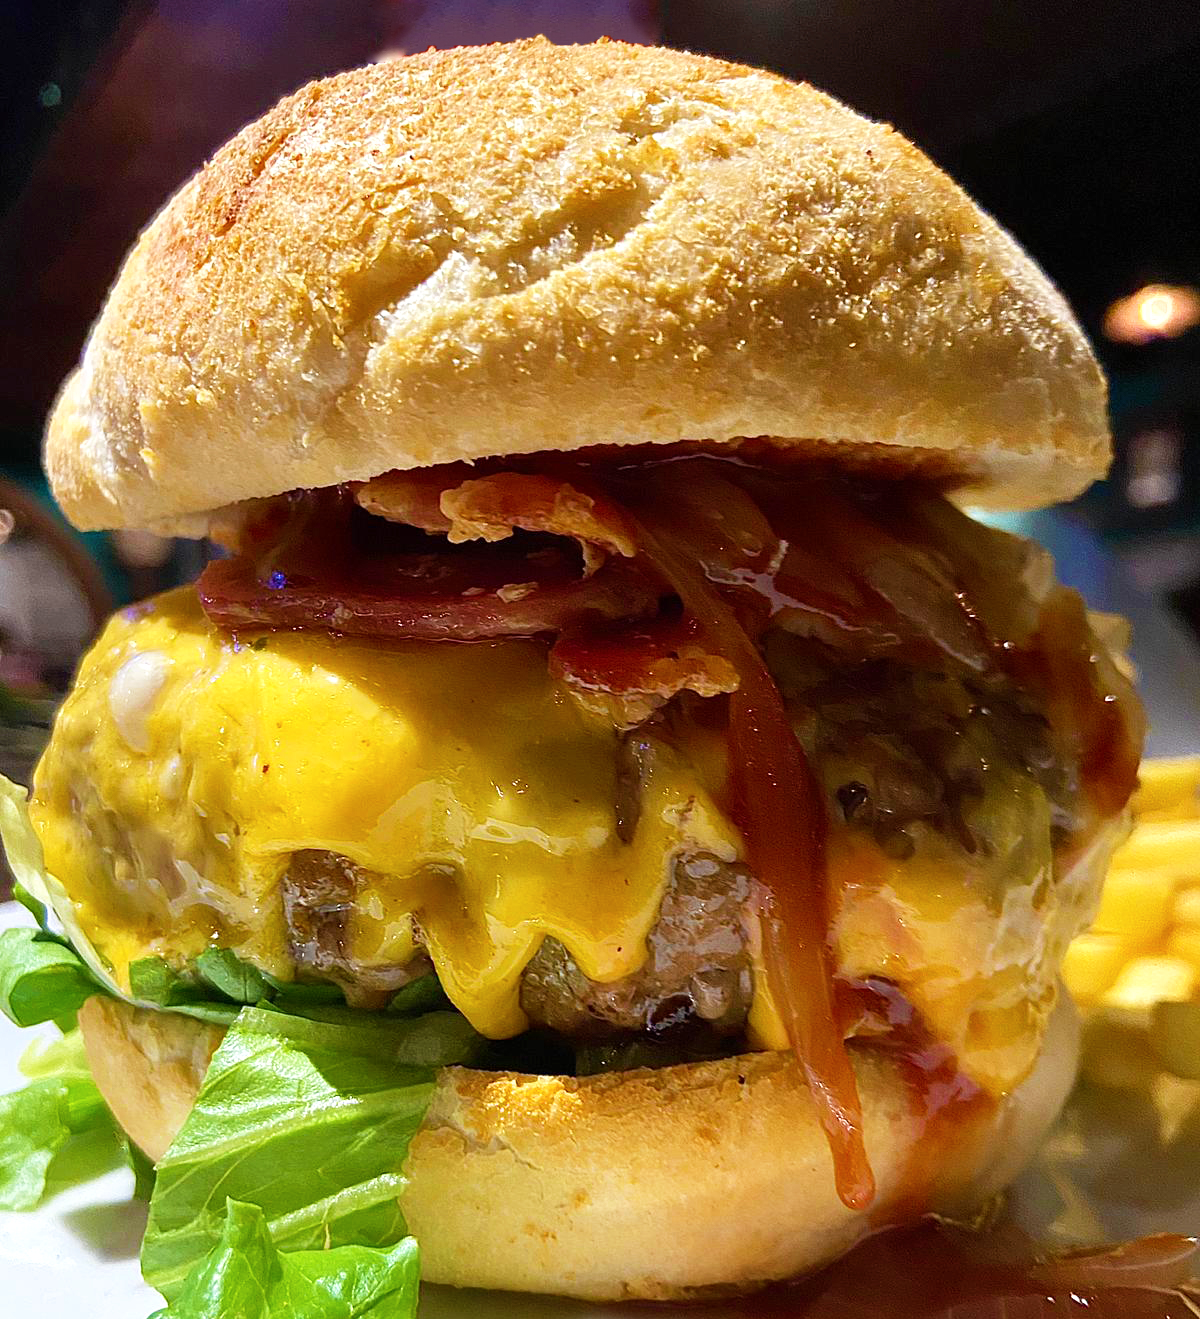 Simona's burger